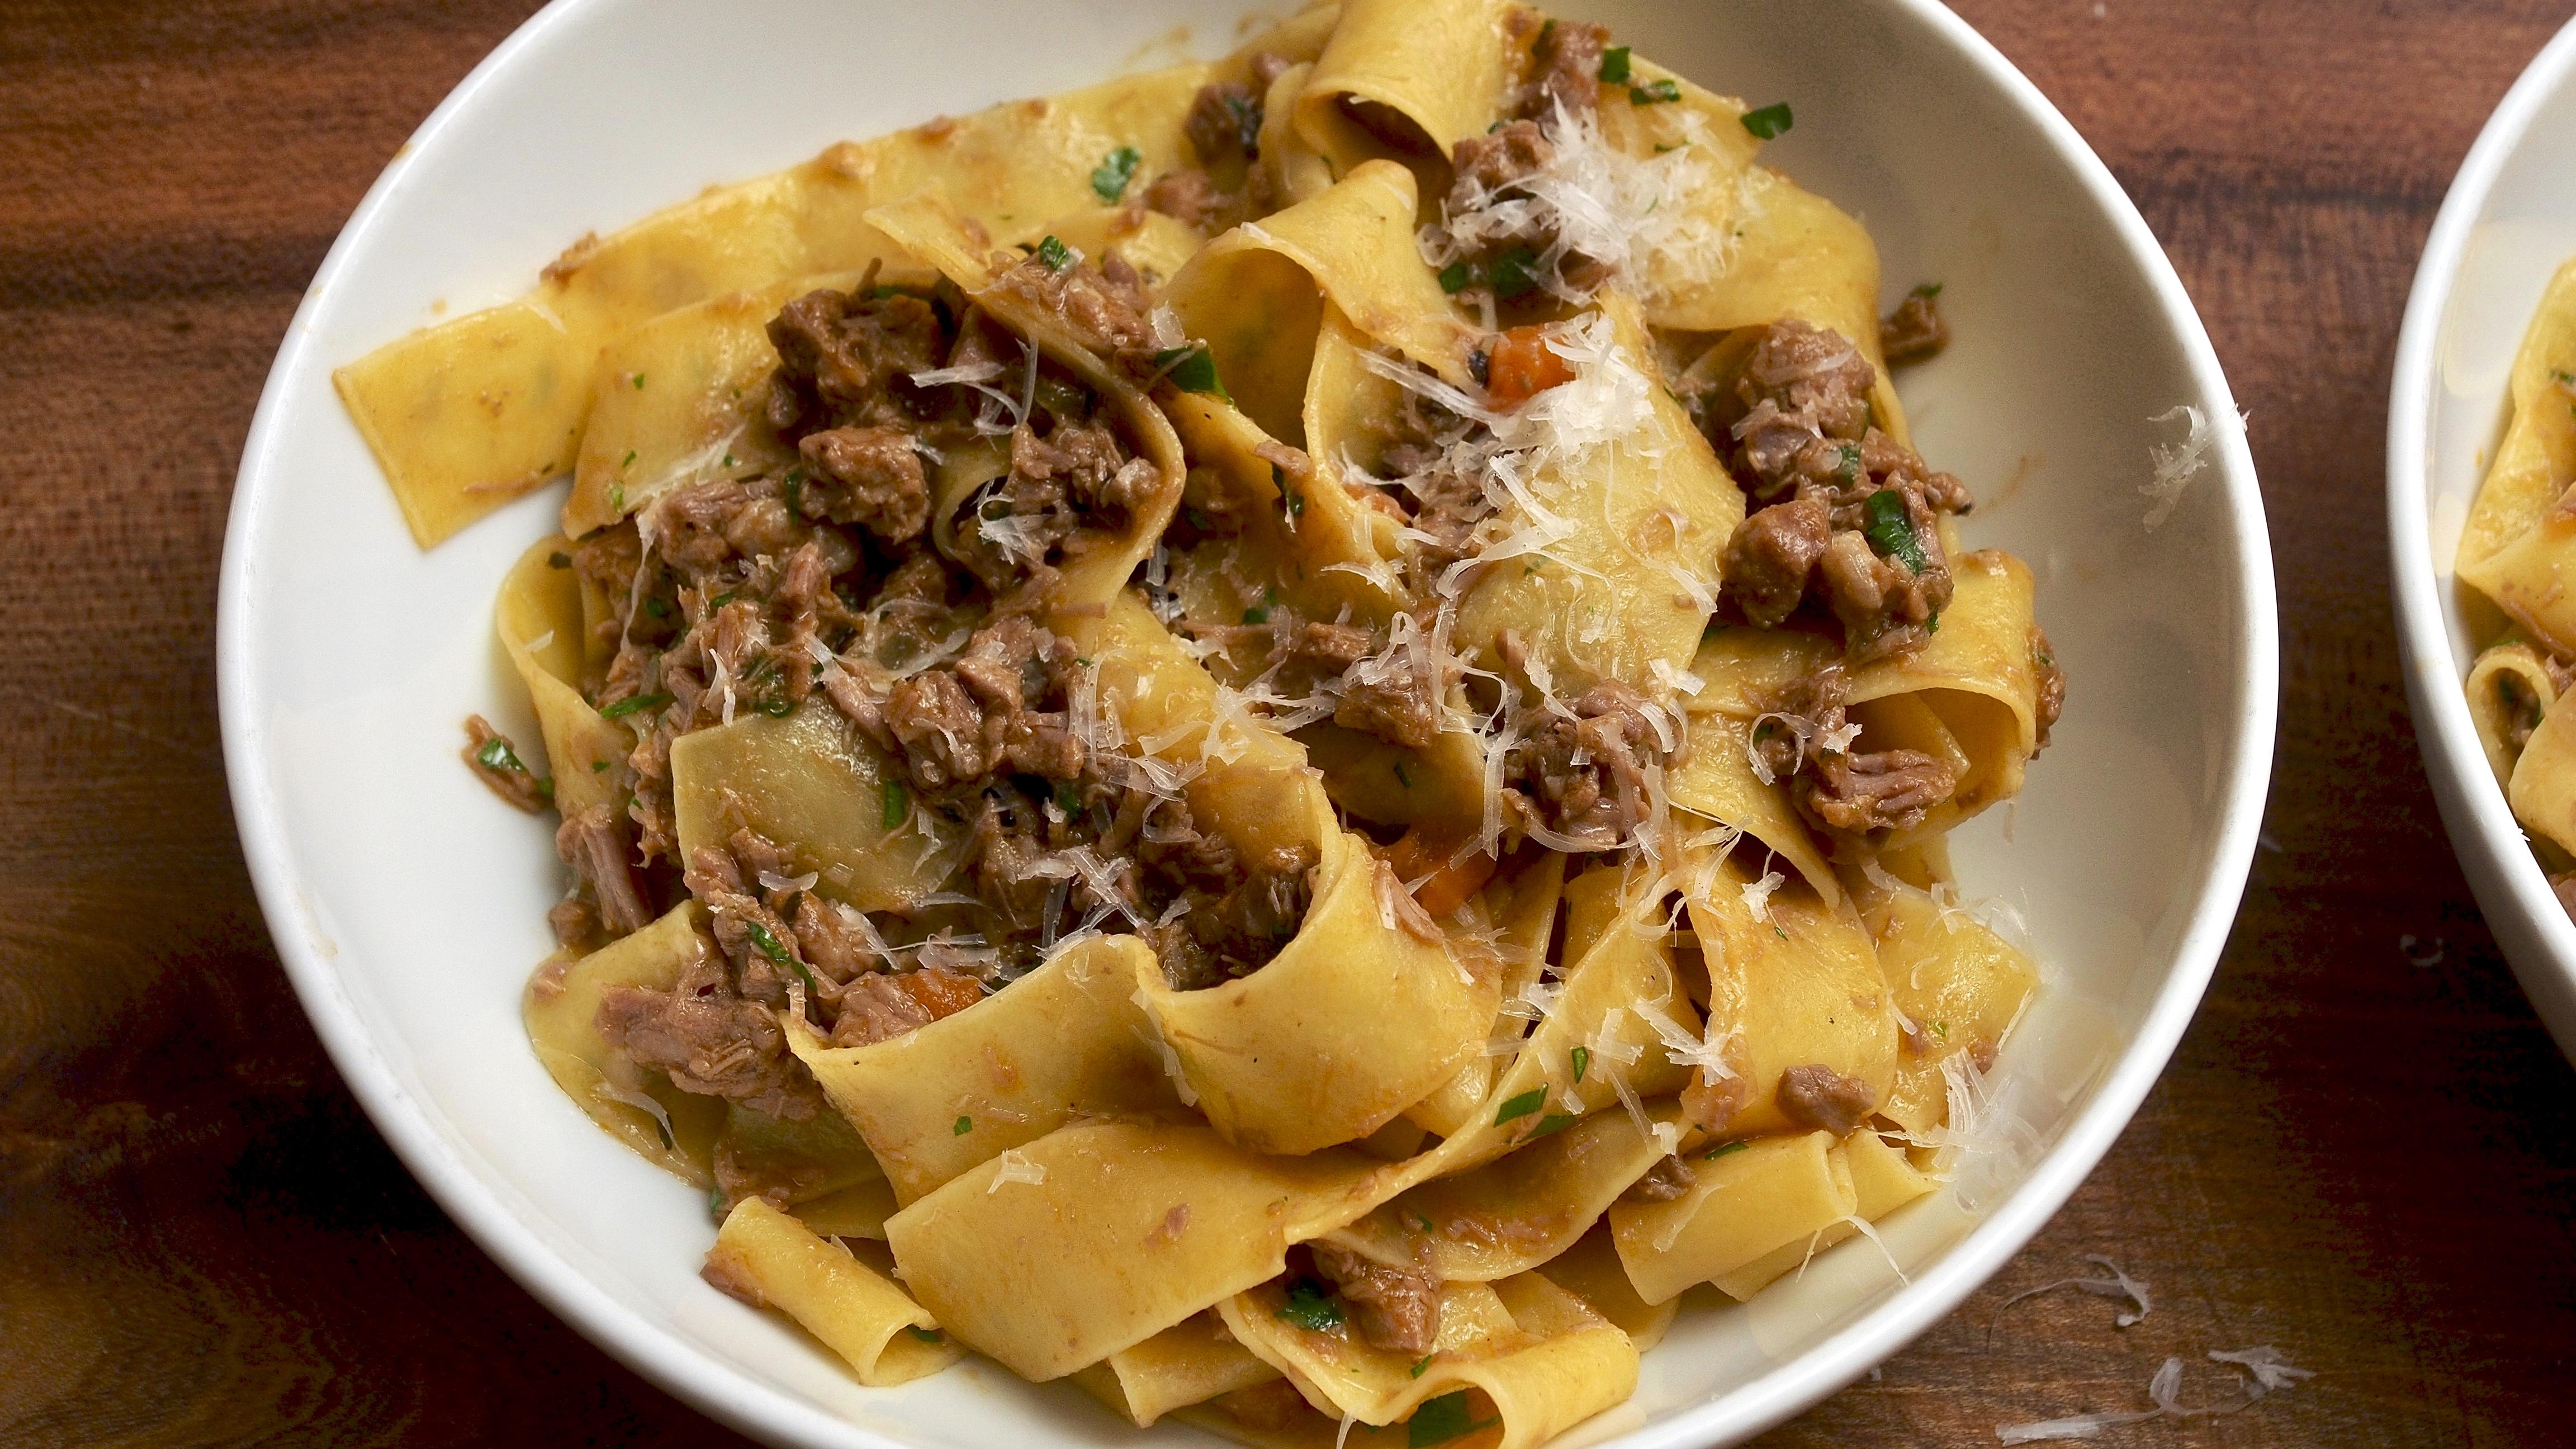 Lamb ragoût with fresh pasta